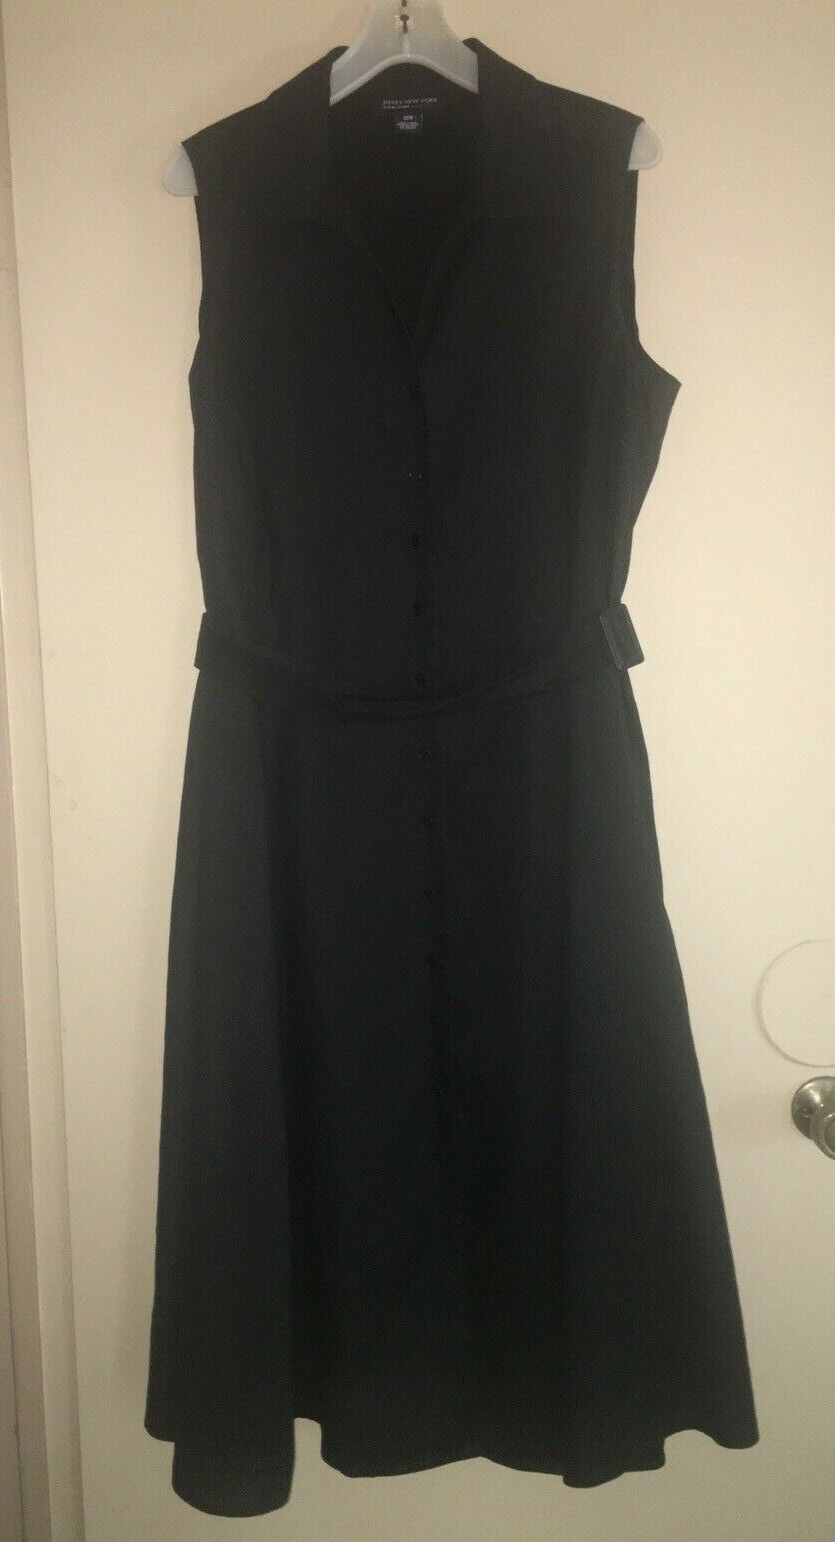 Jones New York Signature Woman 18W Sleeveless Dress Black 100% Linen  Lined